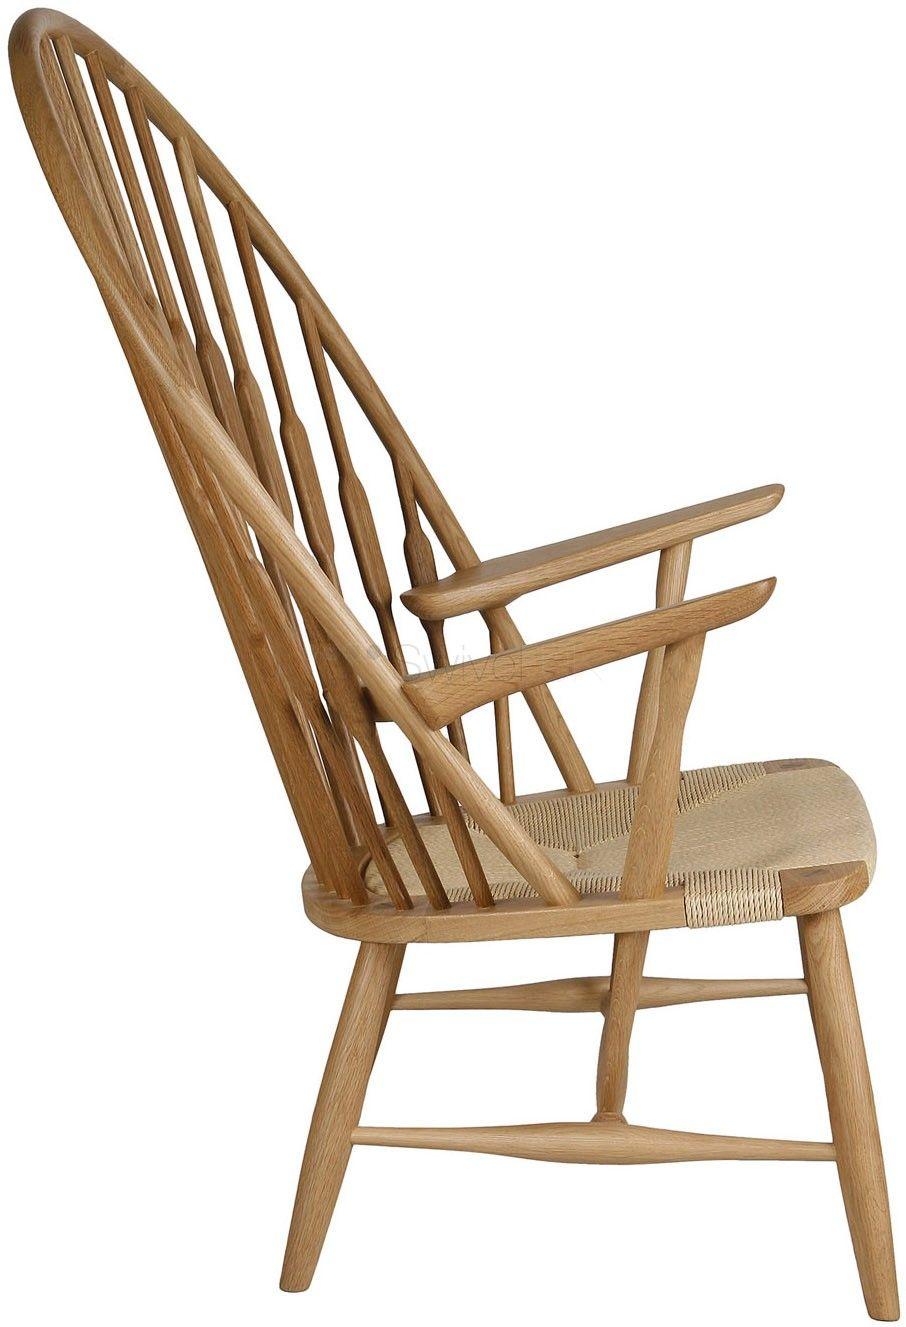 Peacock Chair PP550 Chair, Peacock chair, Chair style